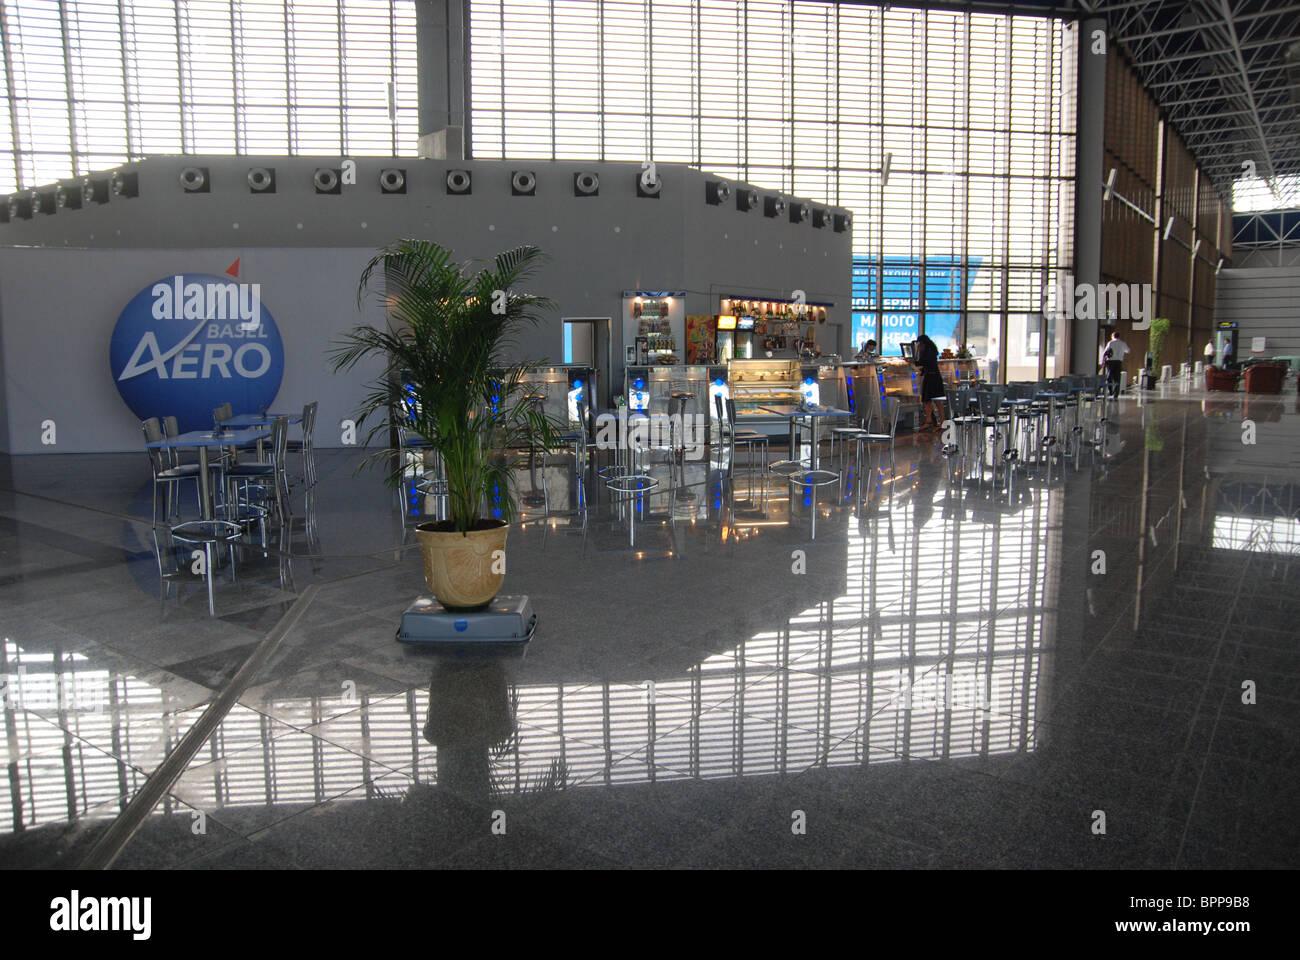 Sochi's 2014 Olympic facilities under construction - Stock Image